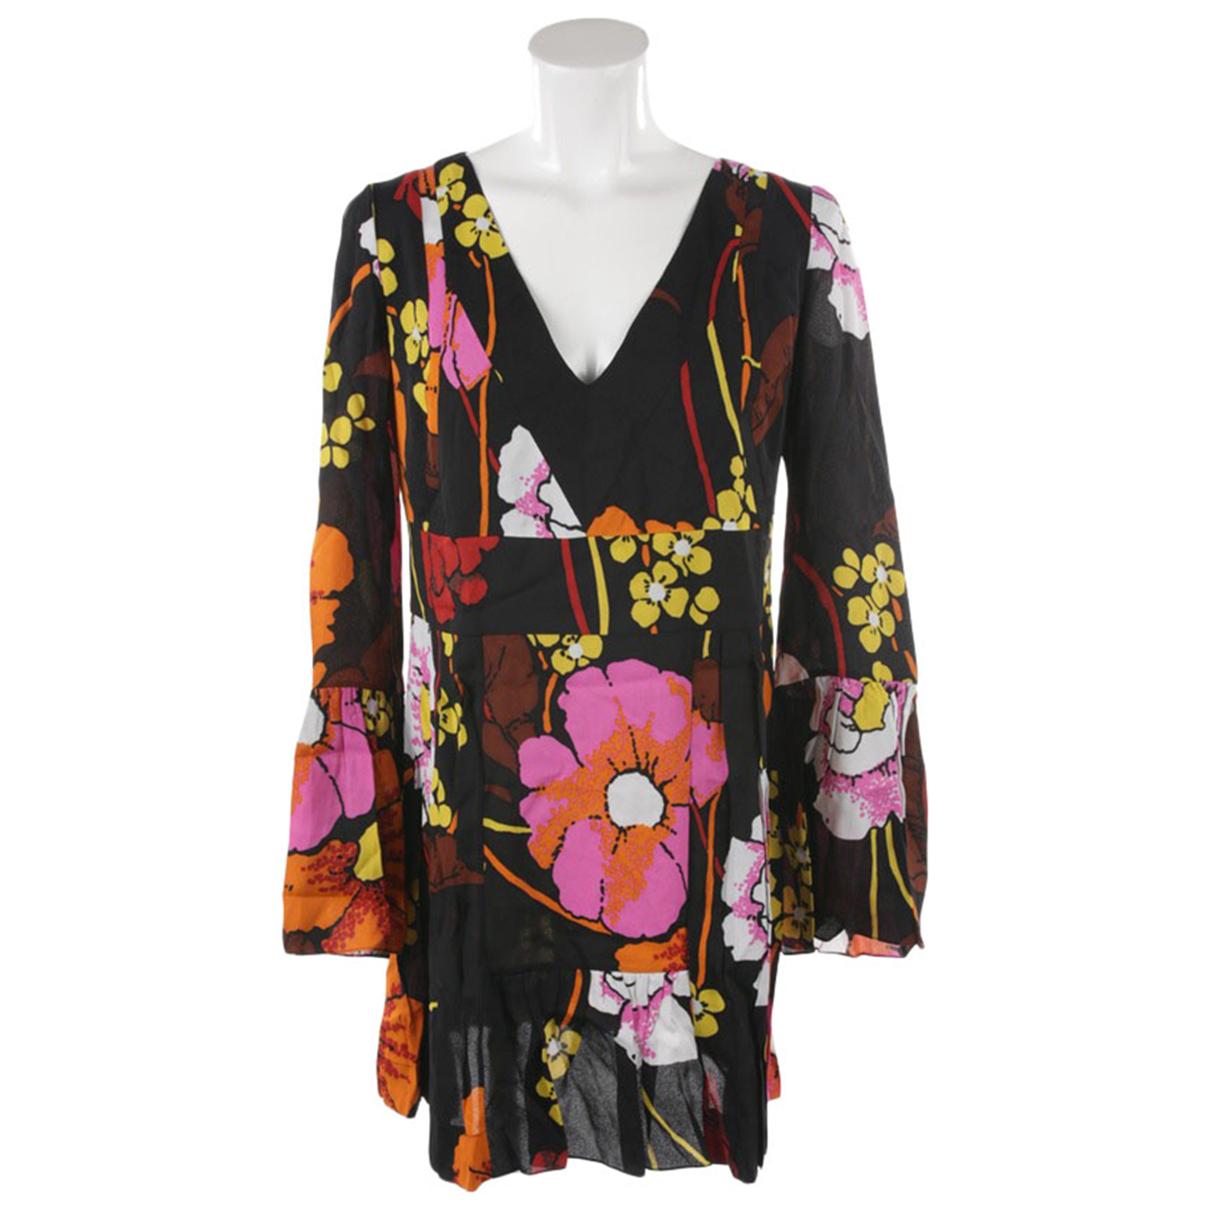 Marni N Multicolour dress for Women 36 IT